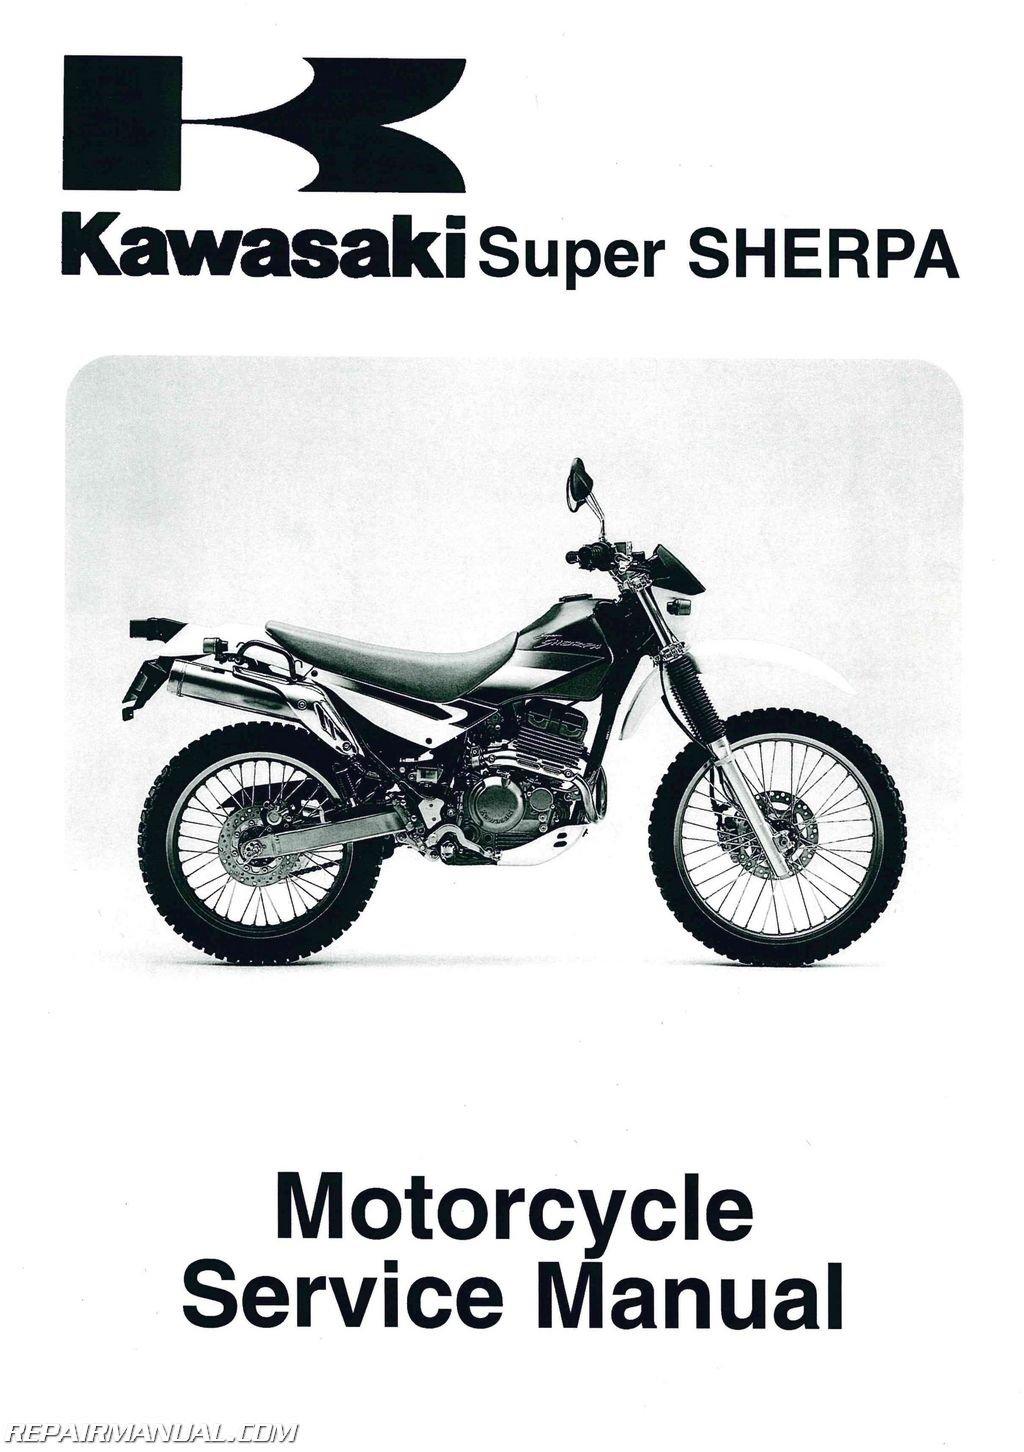 kawasaki kl250 service manual